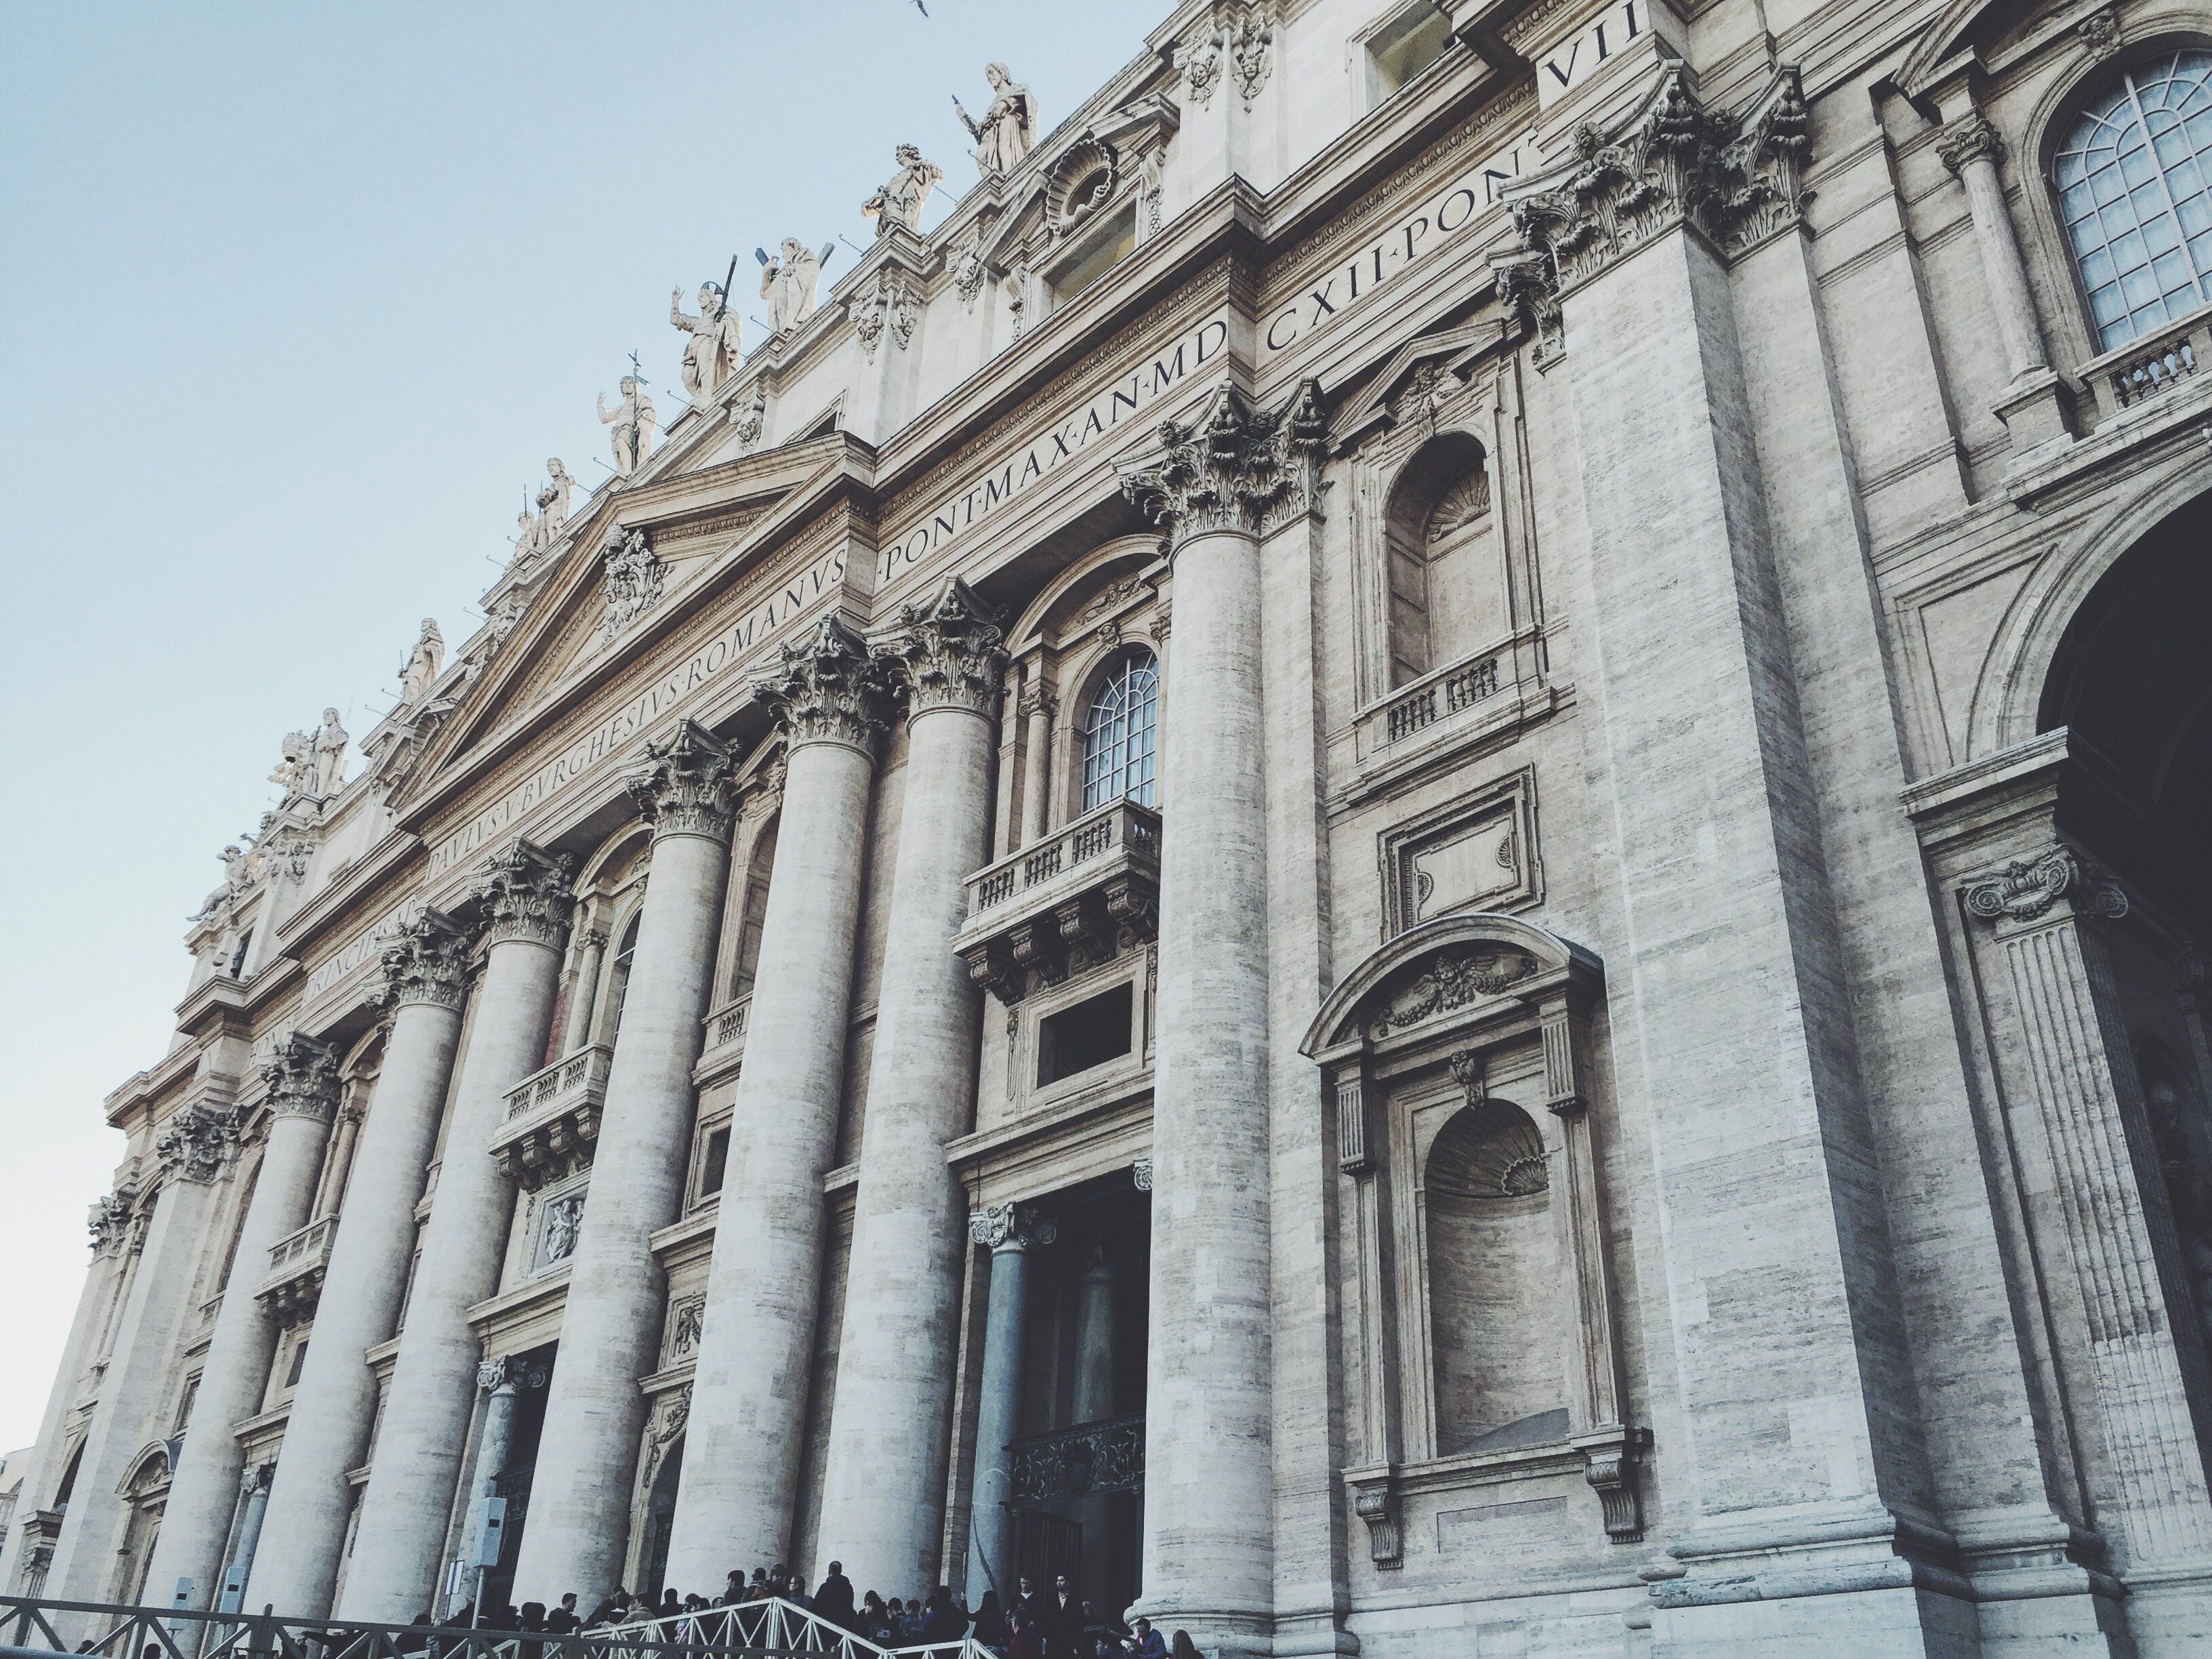 Fotos de stock gratuitas de arquitectura, basílica, edificio, Monumento